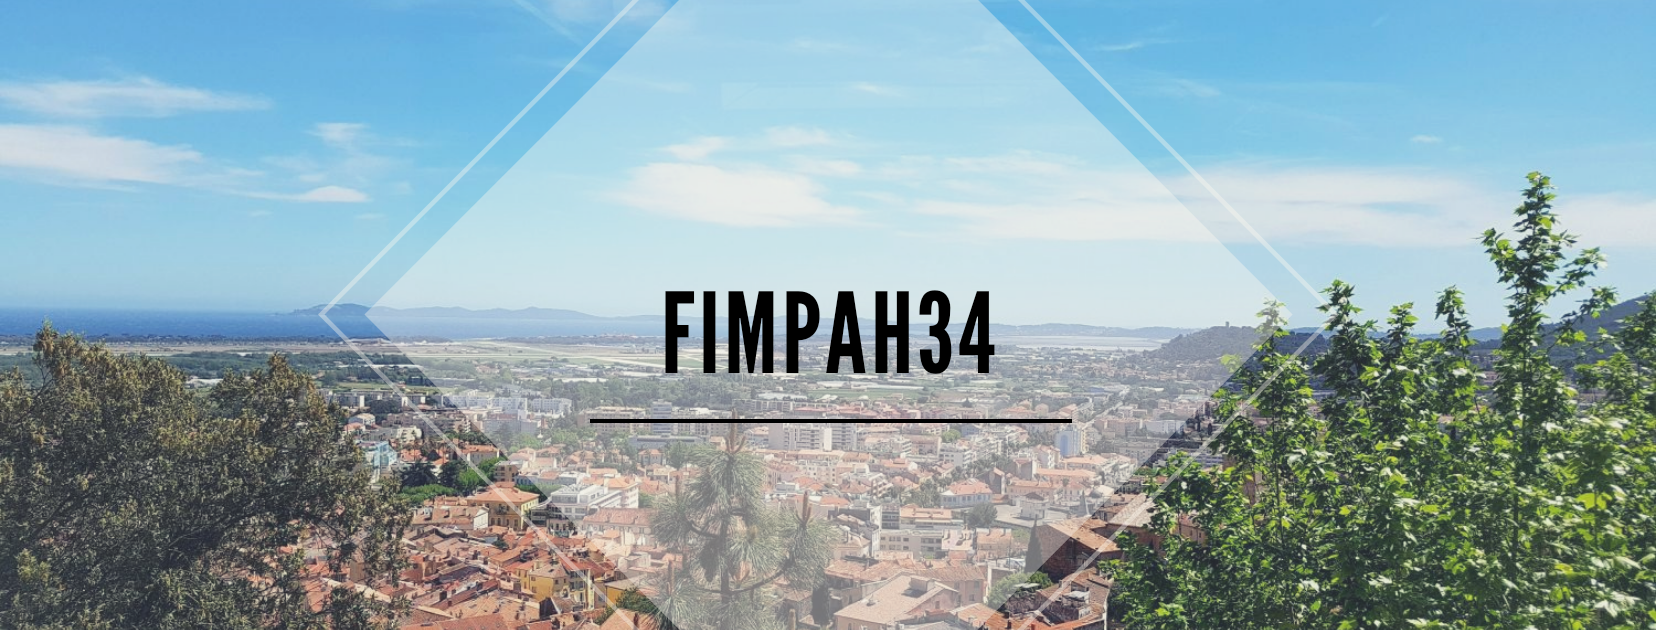 fimpah34-vue-depuis-la-villa